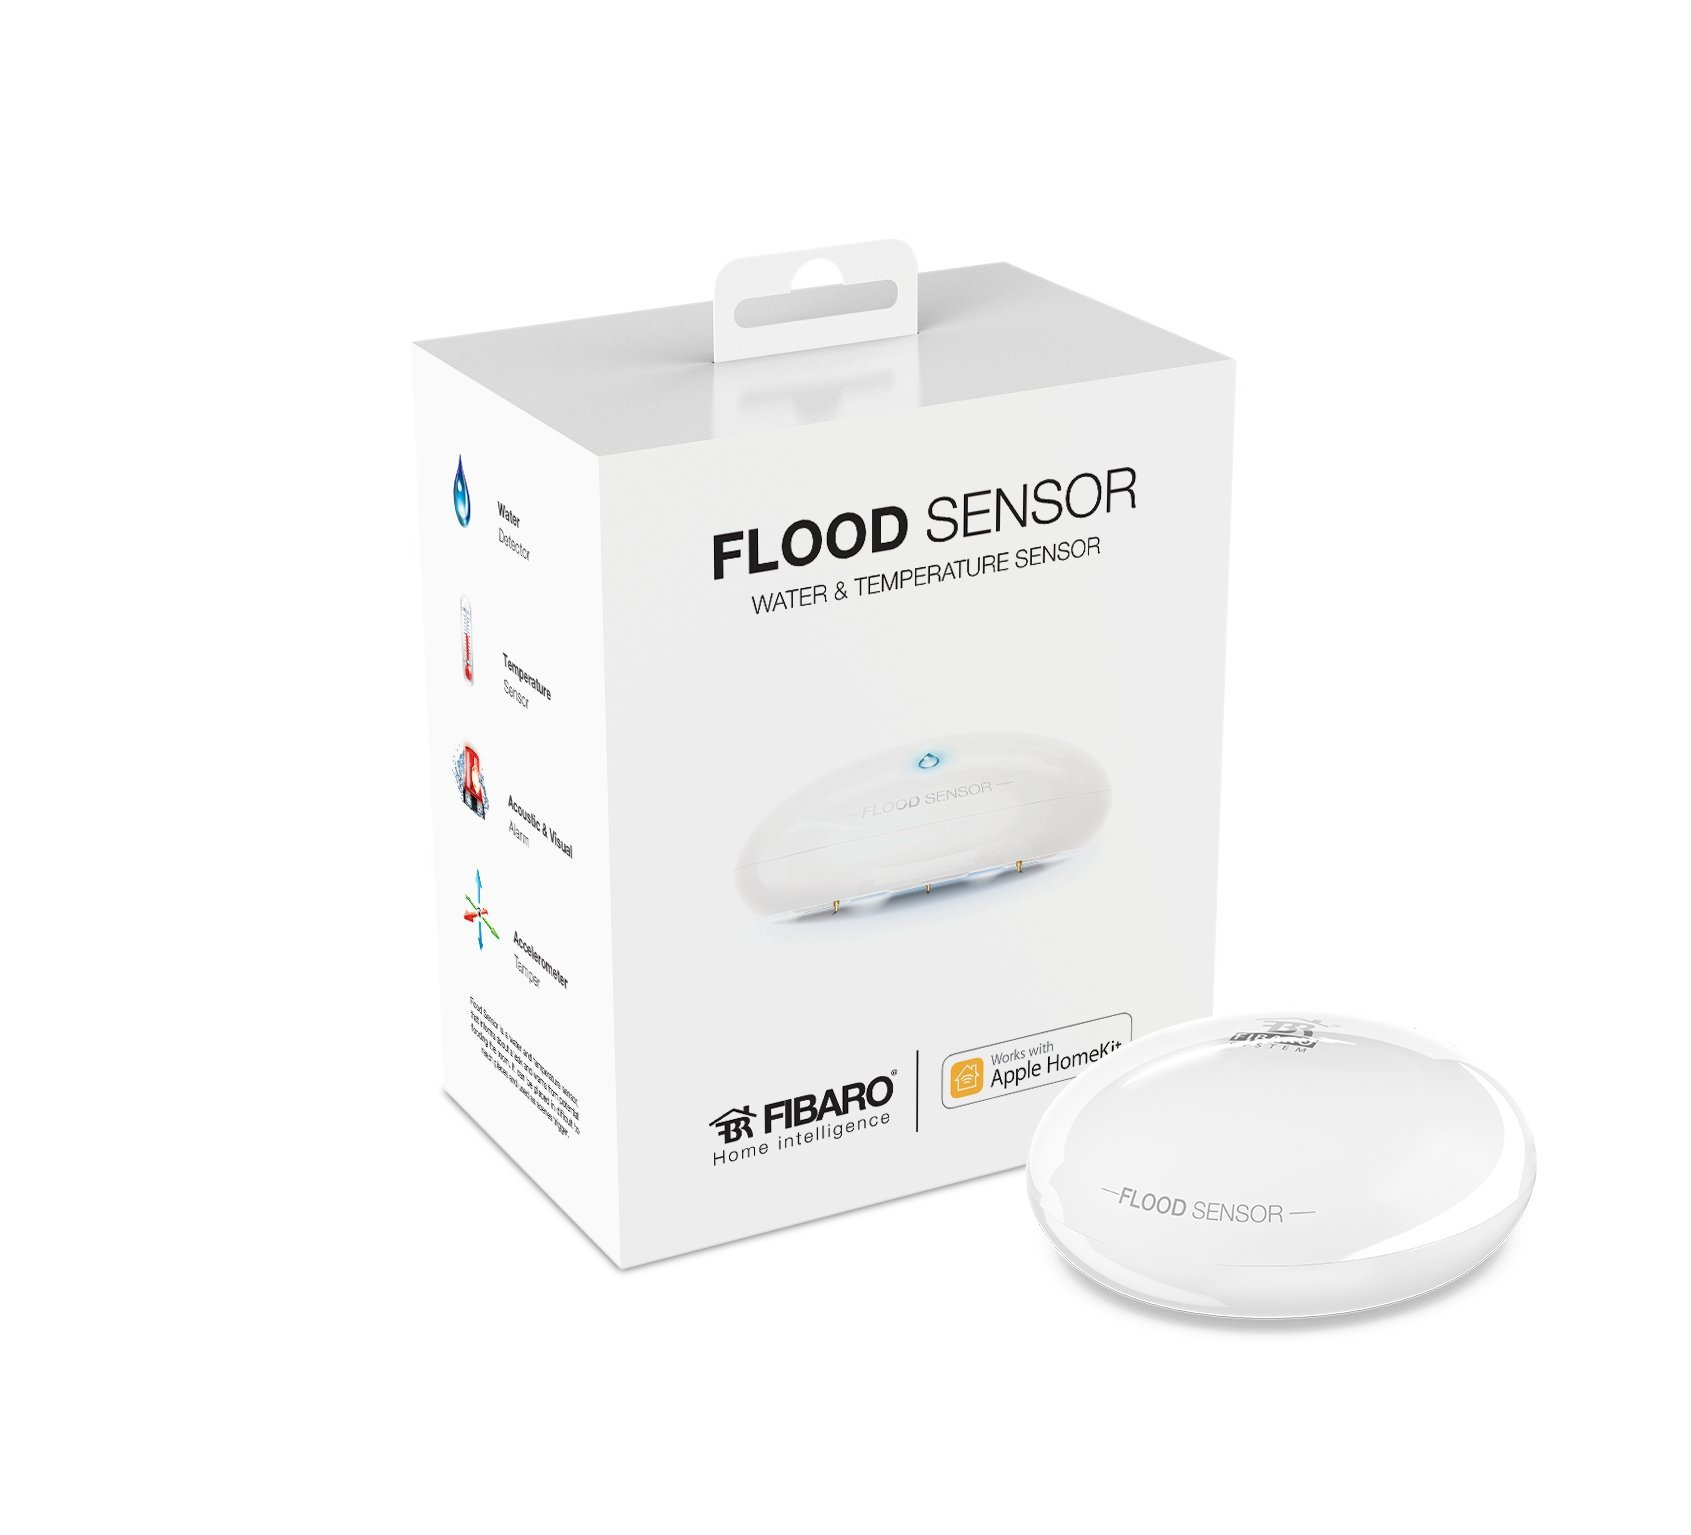 FIBARO HomeKit Flood Sensor, Water & Temperature Sensor for HomeKit only